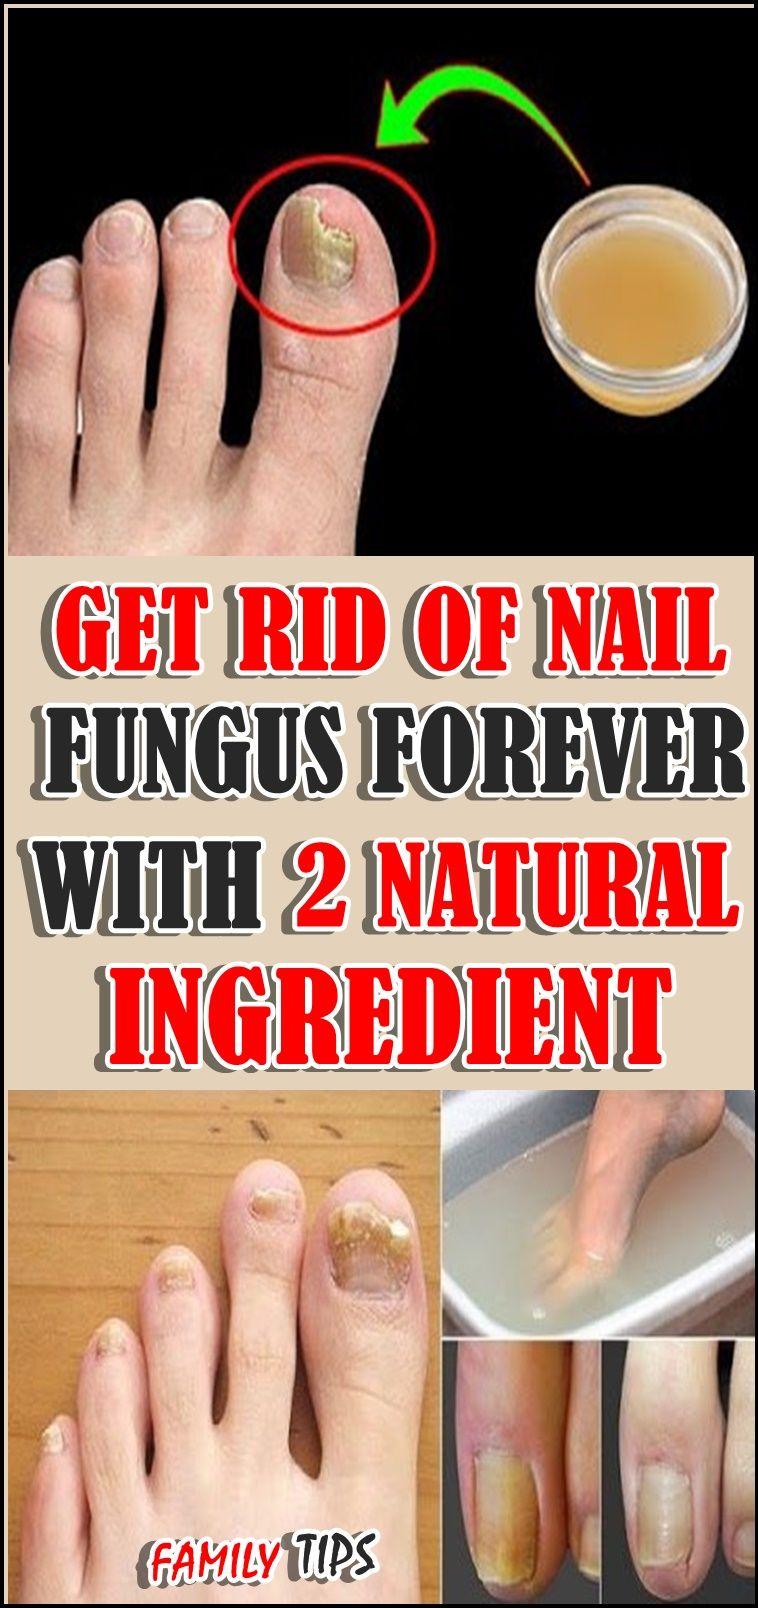 Get Rid Of Nail Fungus Forever With 2 Natural Ingredient Nail Fungus Fungi Toe Nail Discoloration